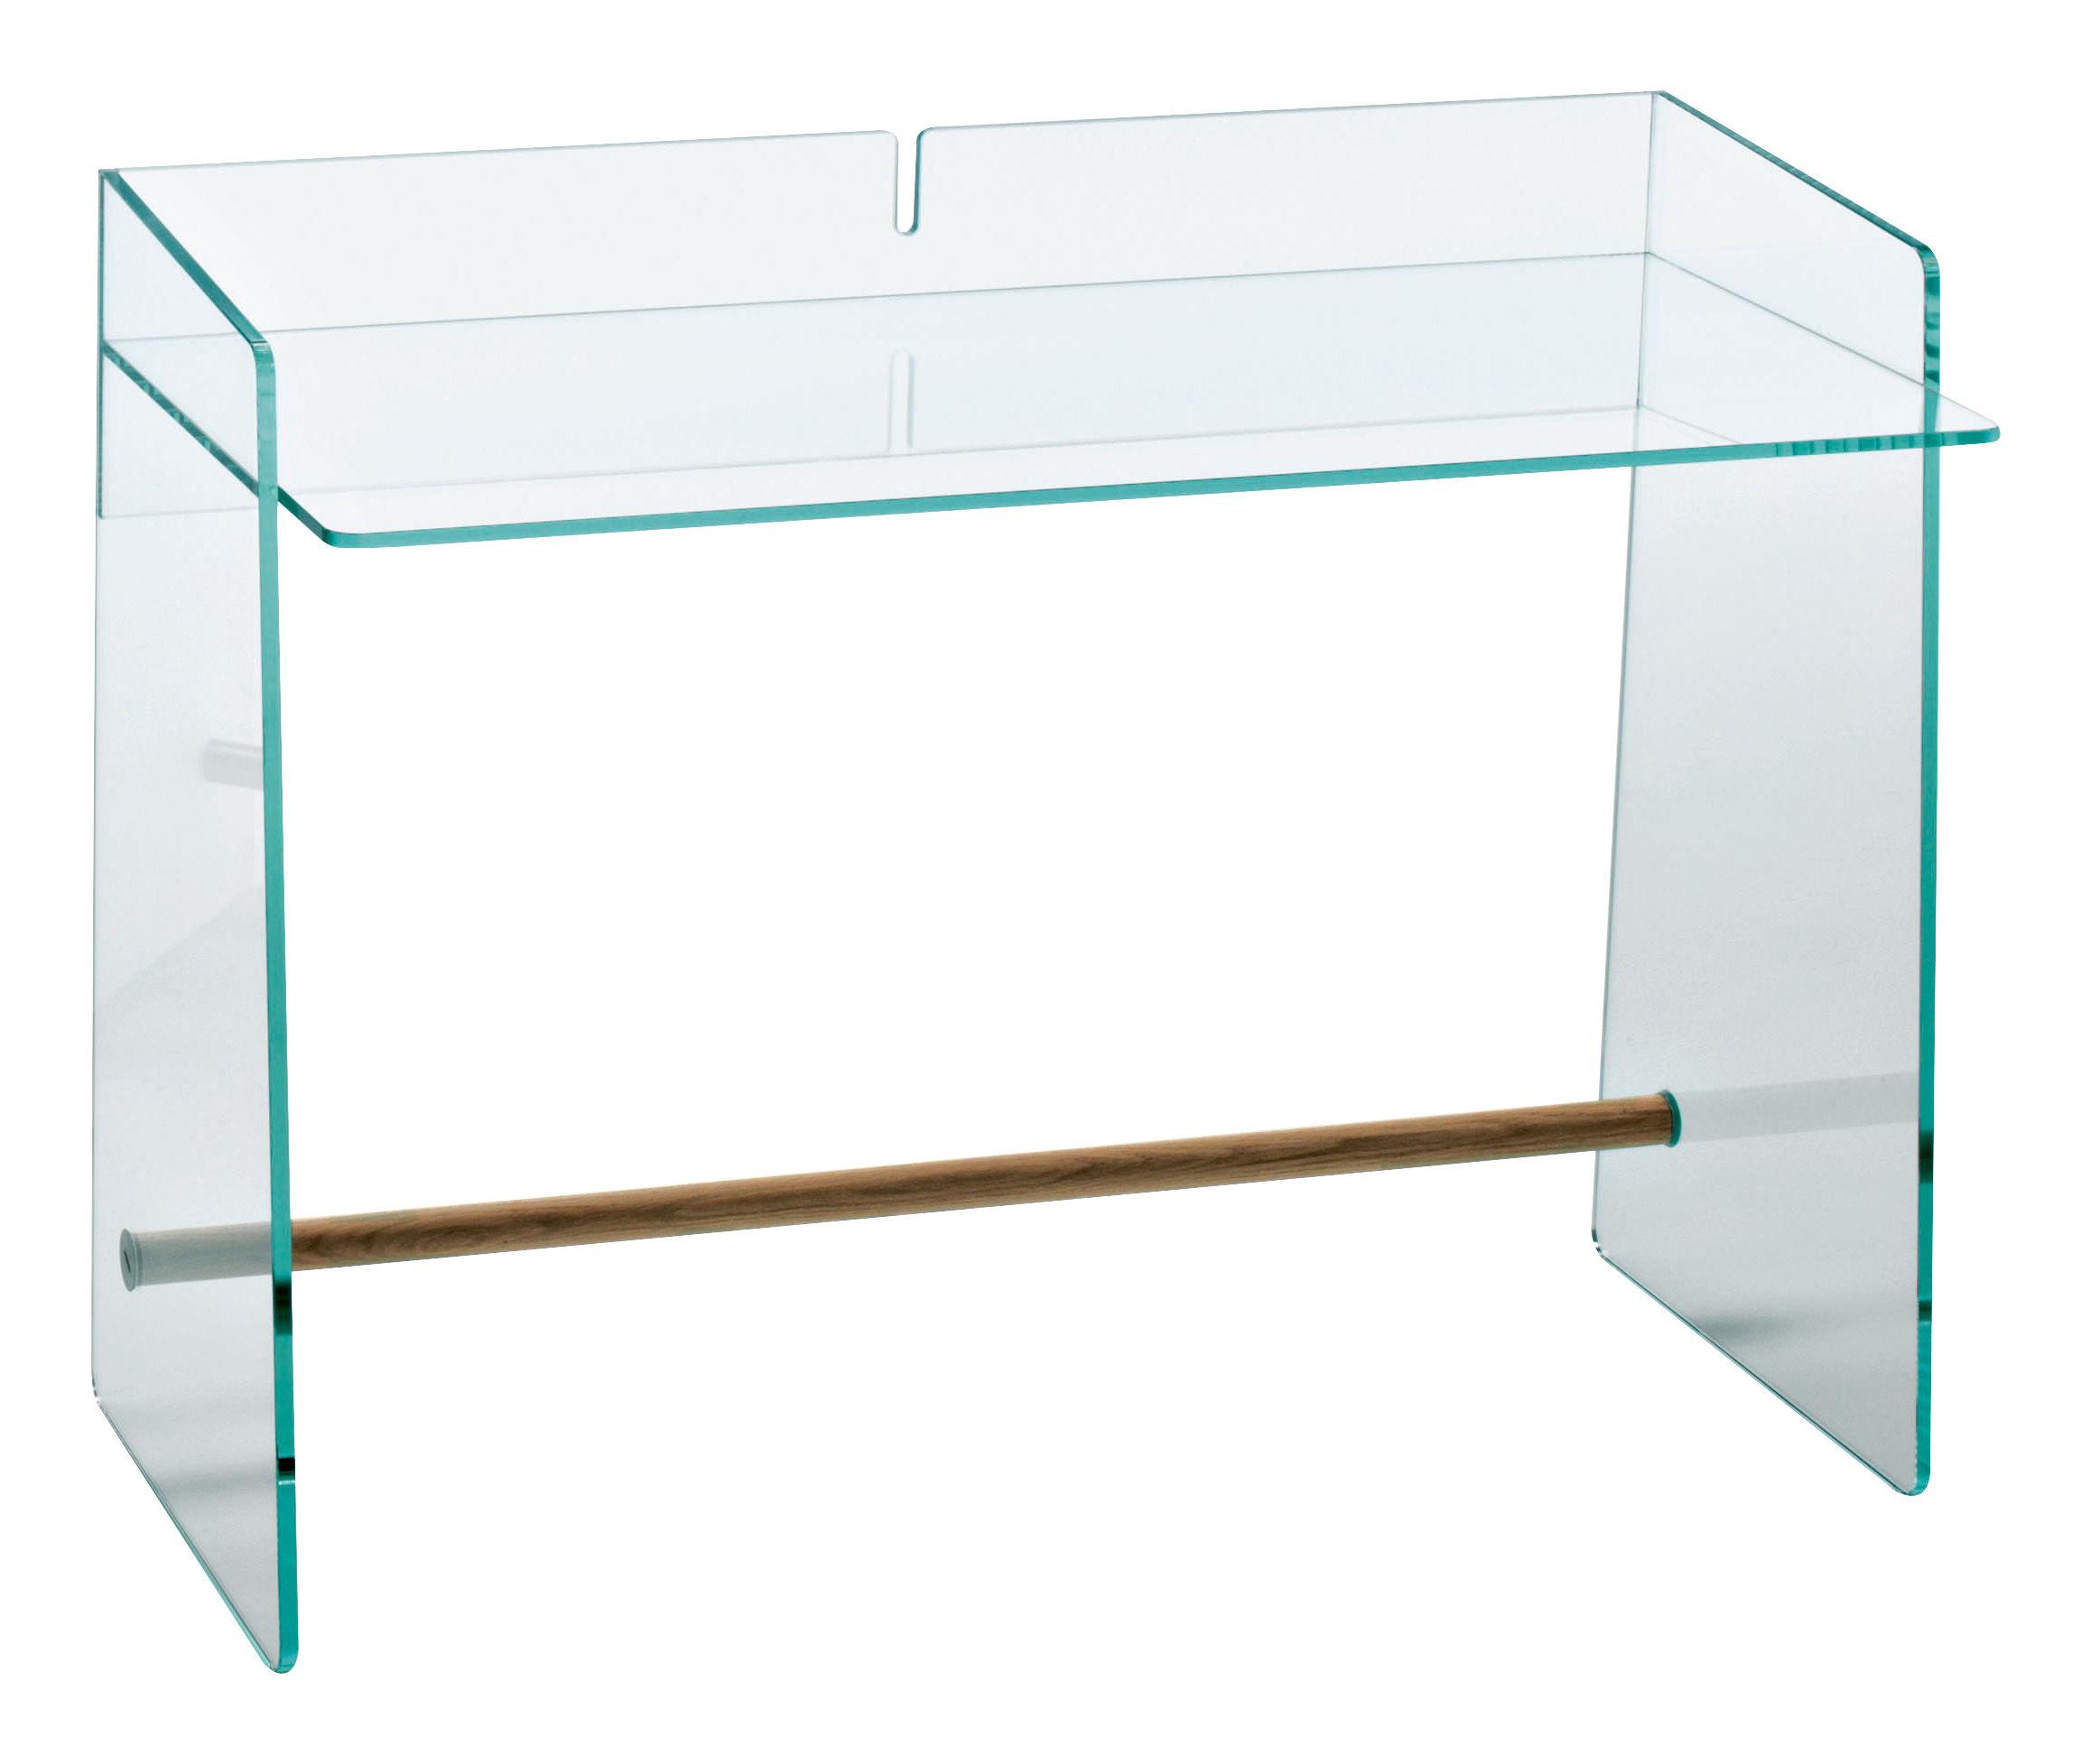 bureau pirandello 110 x 49 cm transparent repose pieds fr ne naturel glas italia. Black Bedroom Furniture Sets. Home Design Ideas